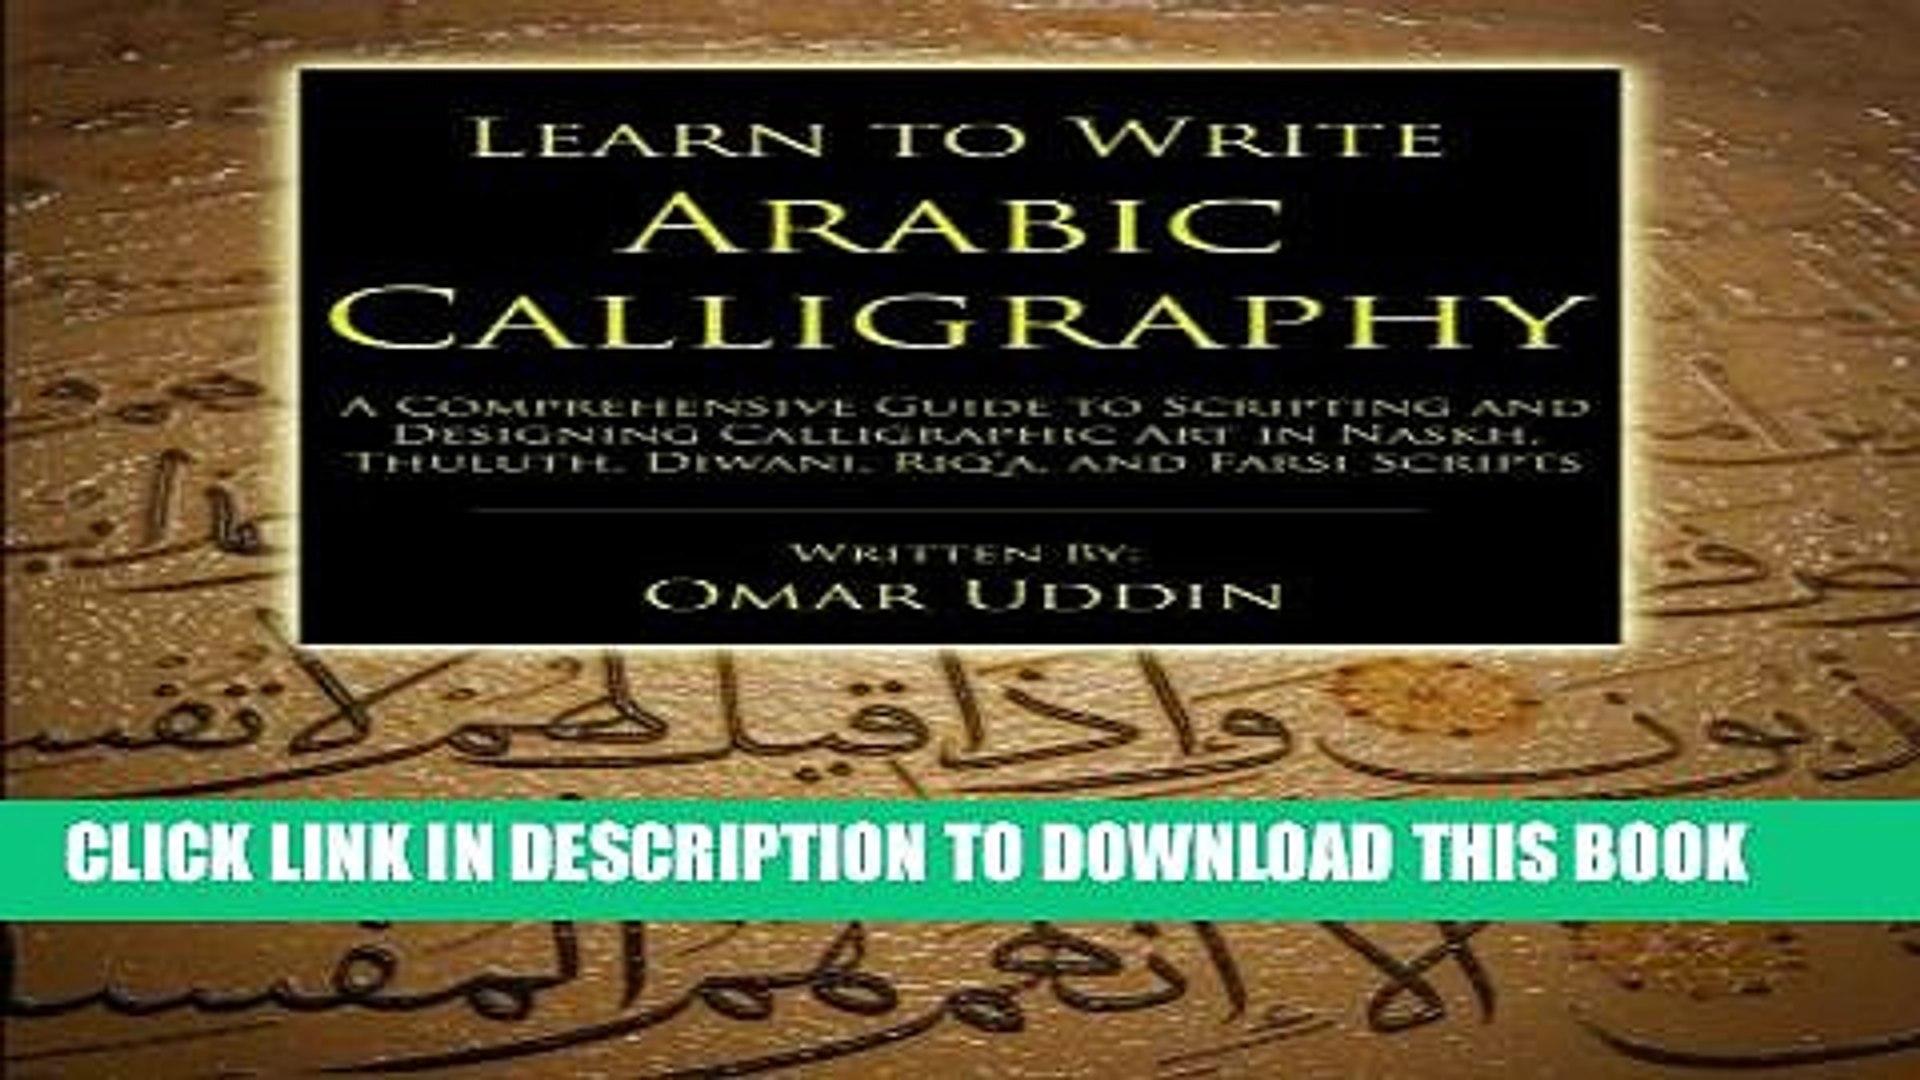 Aracal arabic calligraphy evolution through time english edition.